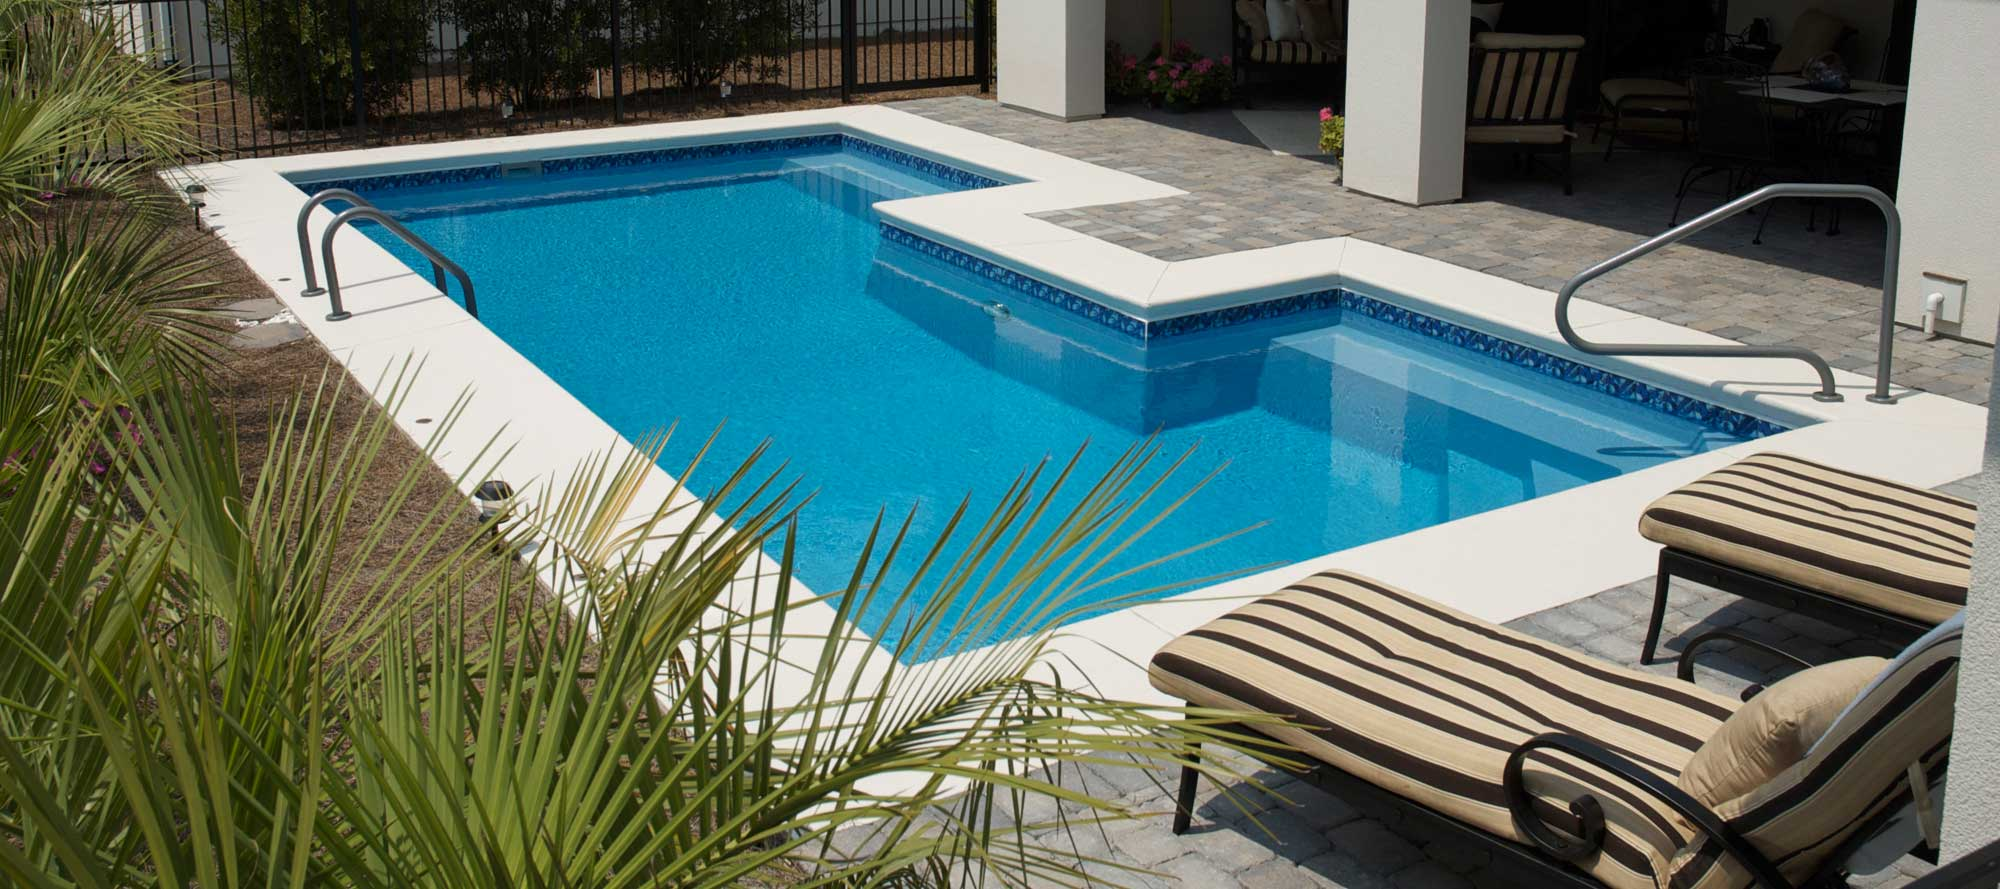 Best Custom Inground Swimming Pool Company Fairfield County CT